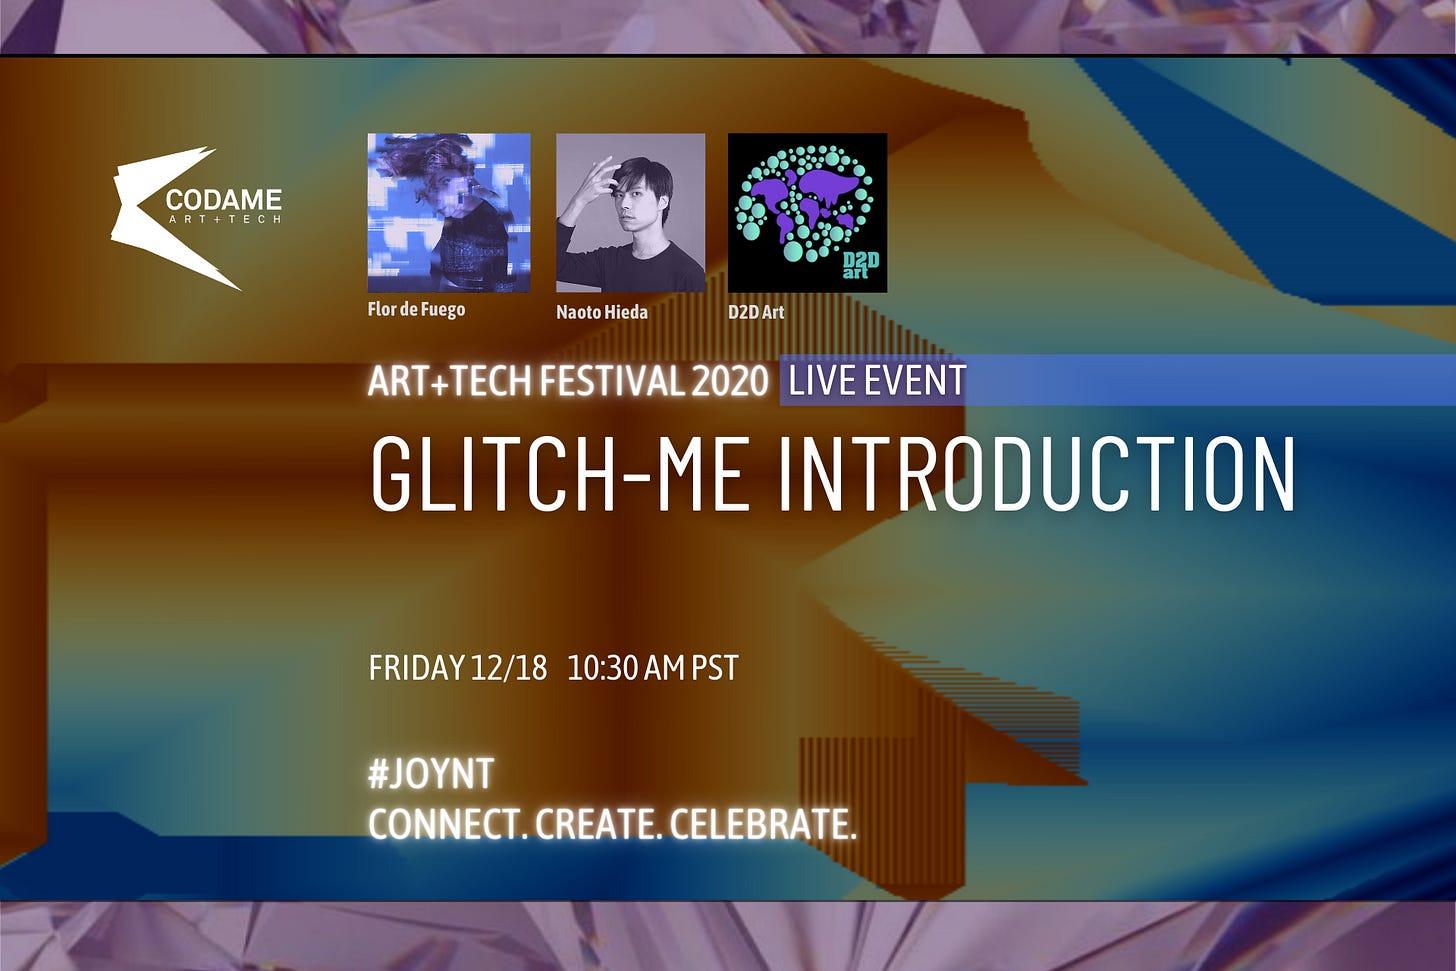 Glitch-me Introduction